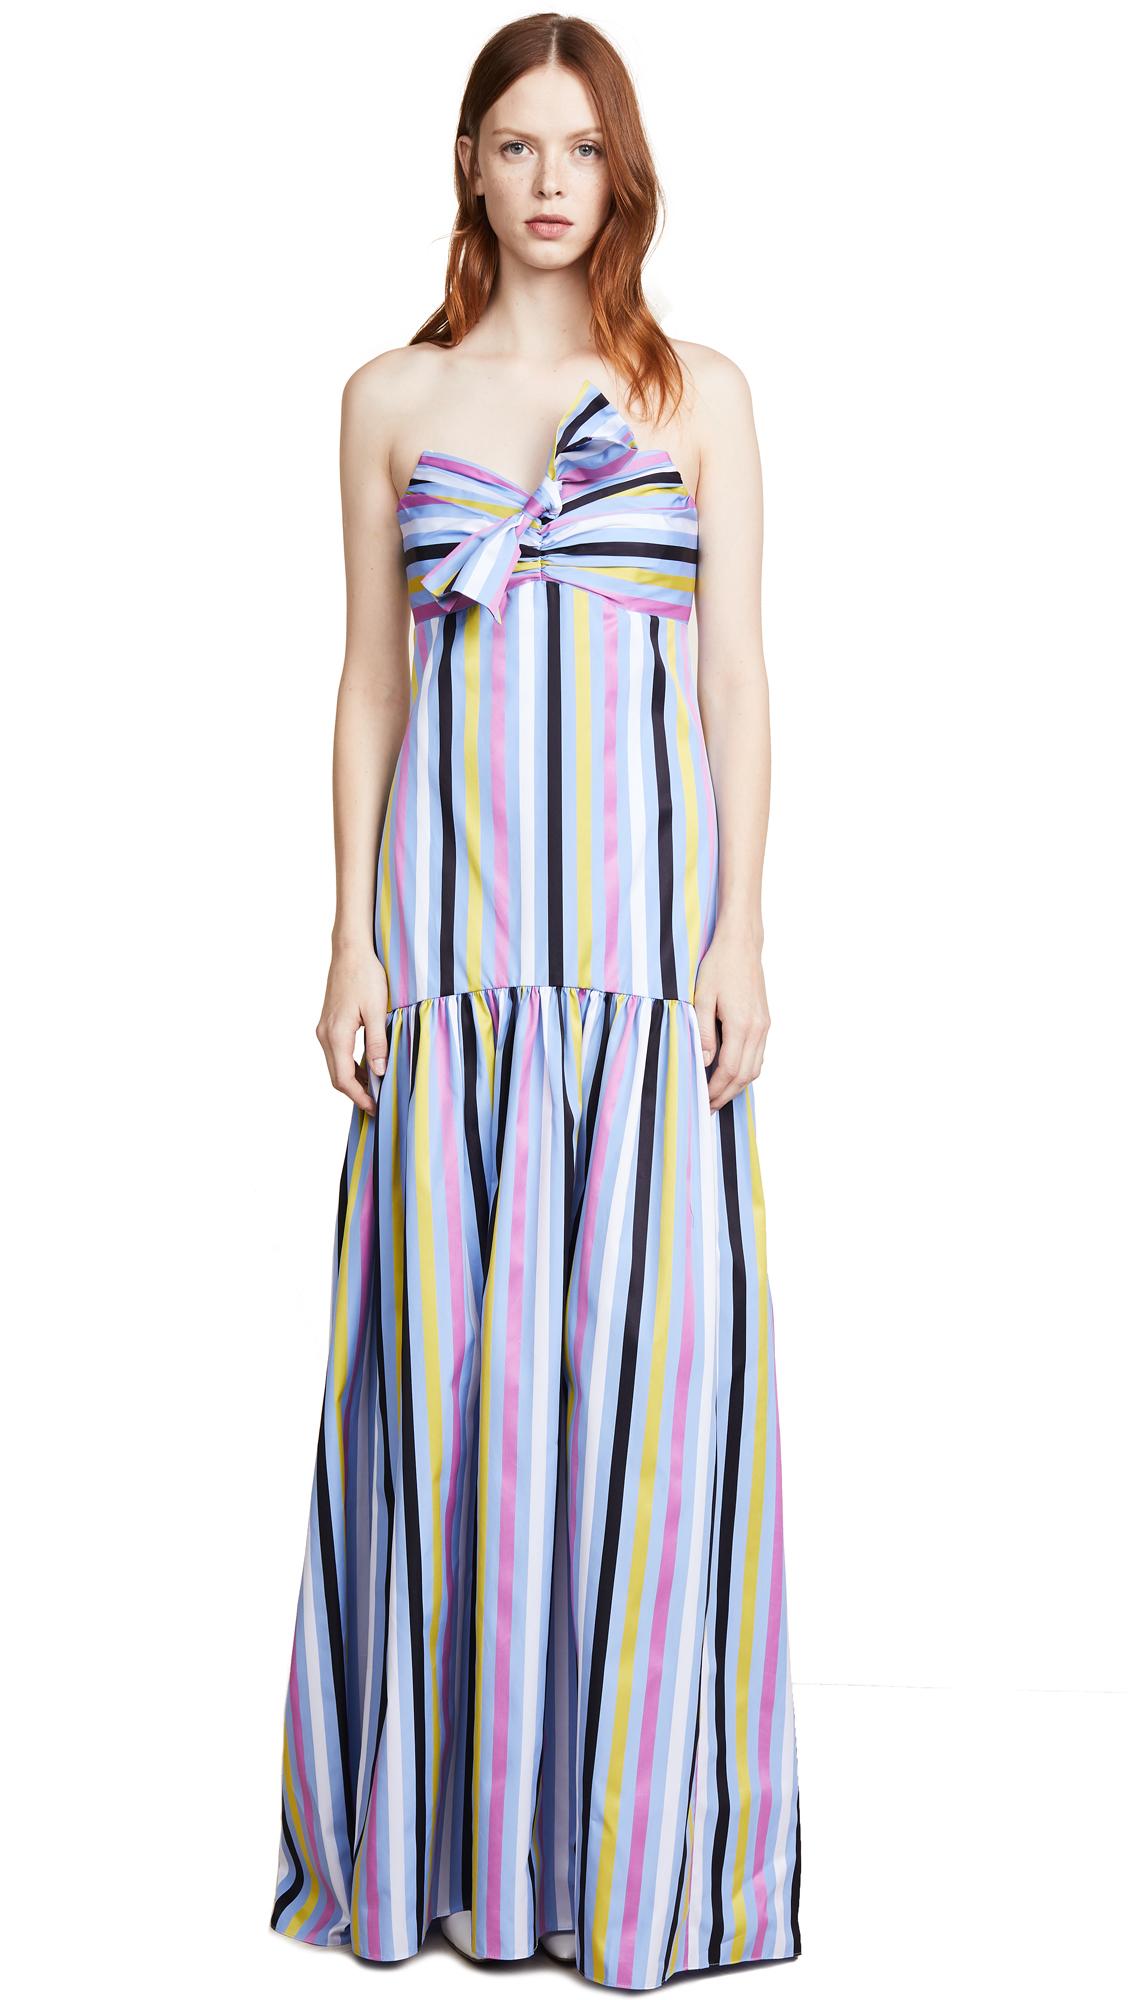 Caroline Constas Strapless Maxi Dress In Peacock Multi